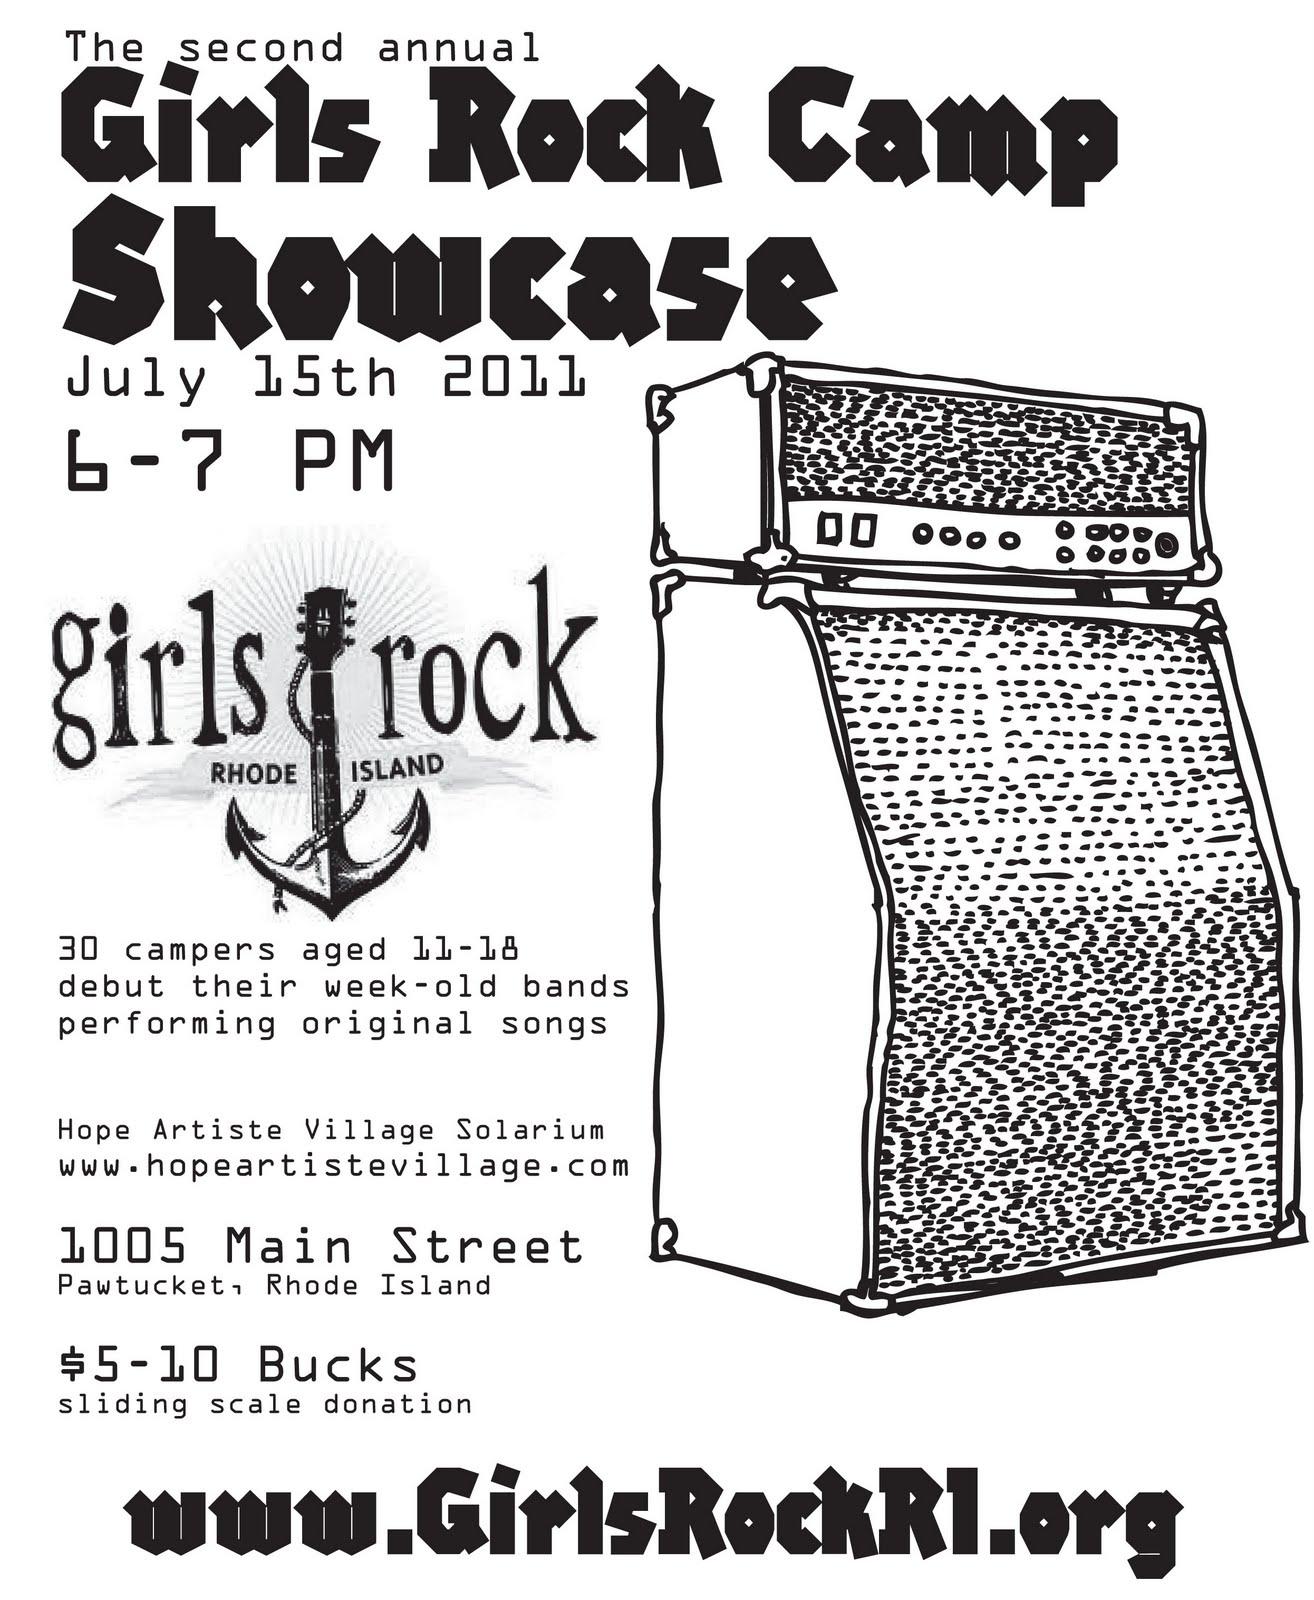 Delia Kovac: Girls Rock Camp Showcase flyer.